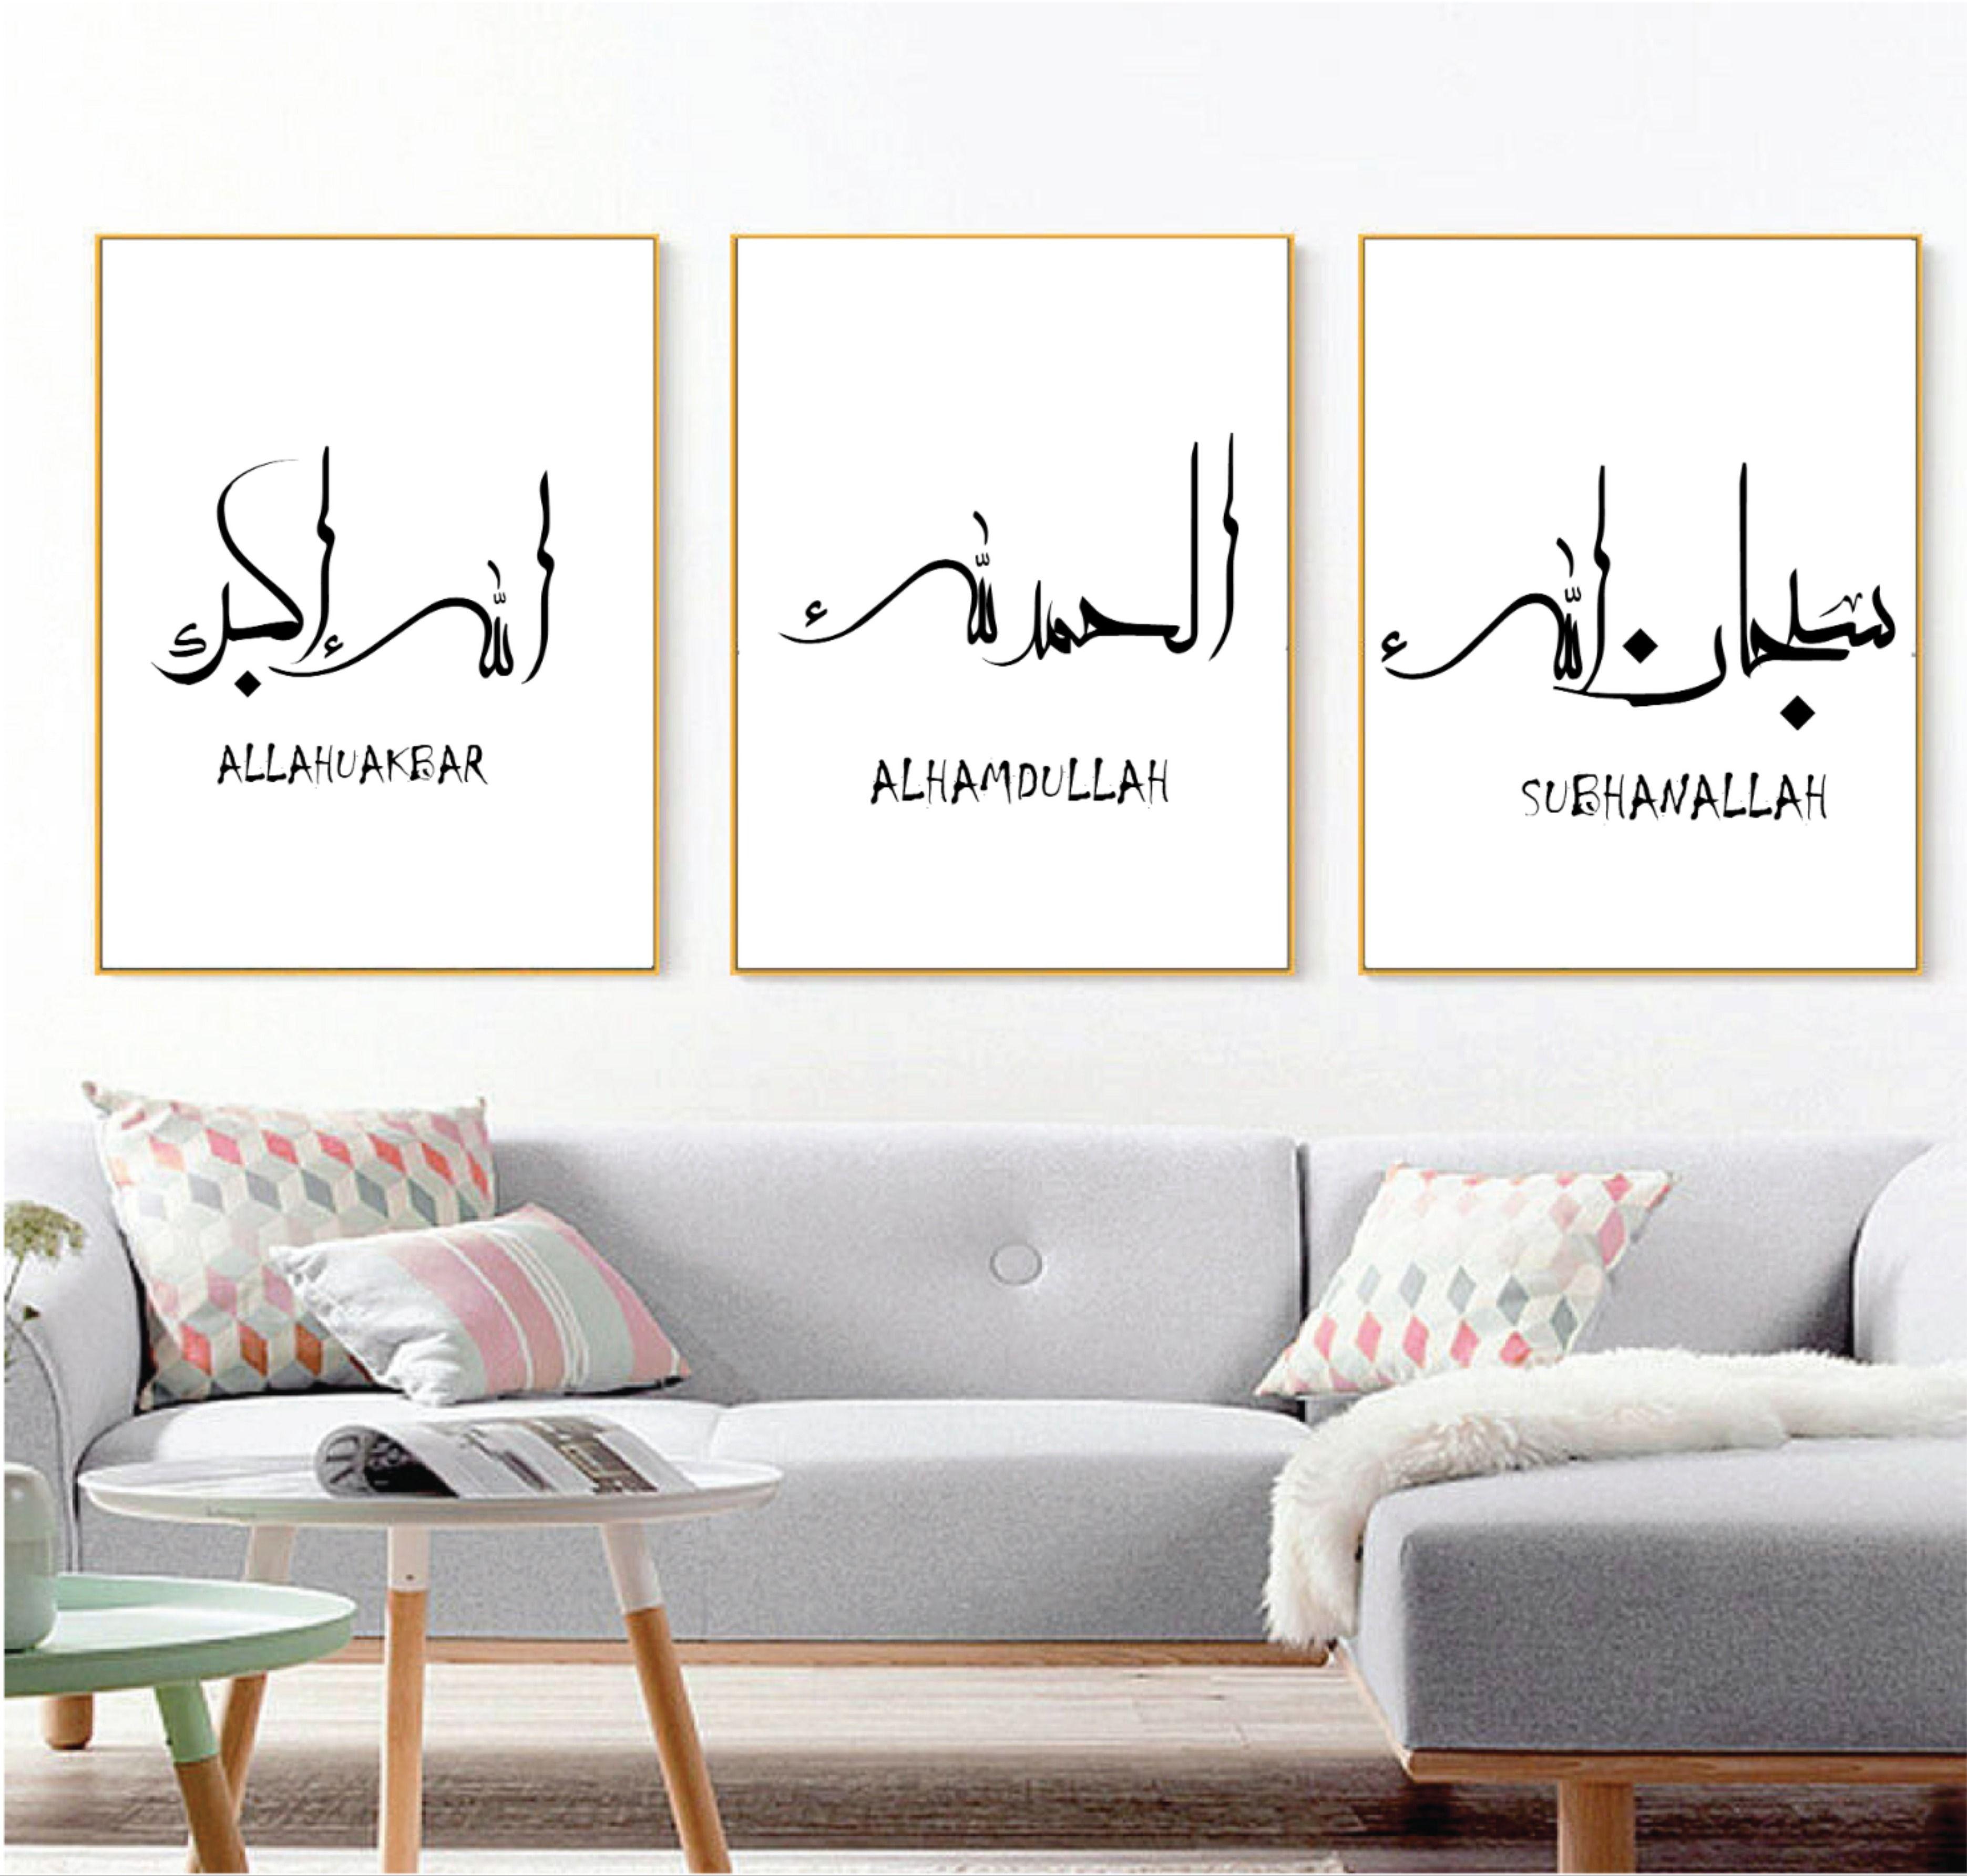 Arabic Calligraphy Wall Art Calligraphy Wall Art Islamic Decor Islamic Wall Decor